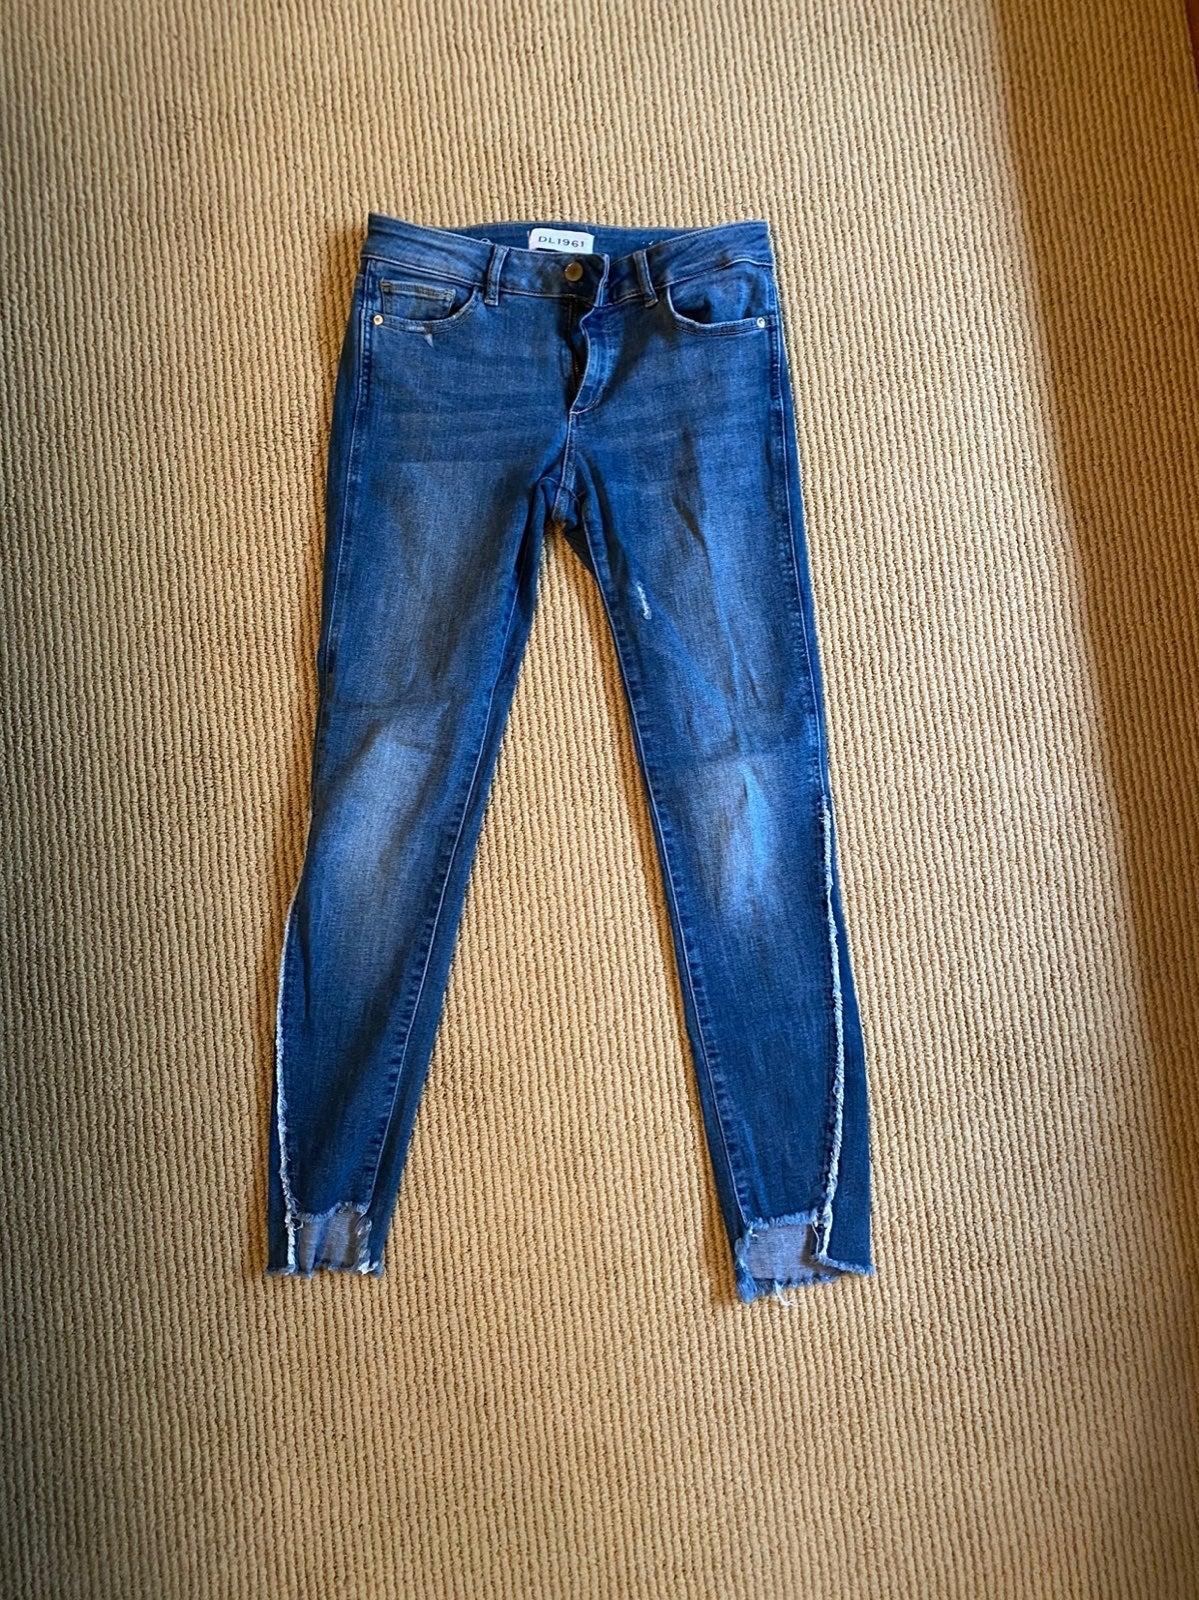 DL1961 size 27 Skinny Jeans